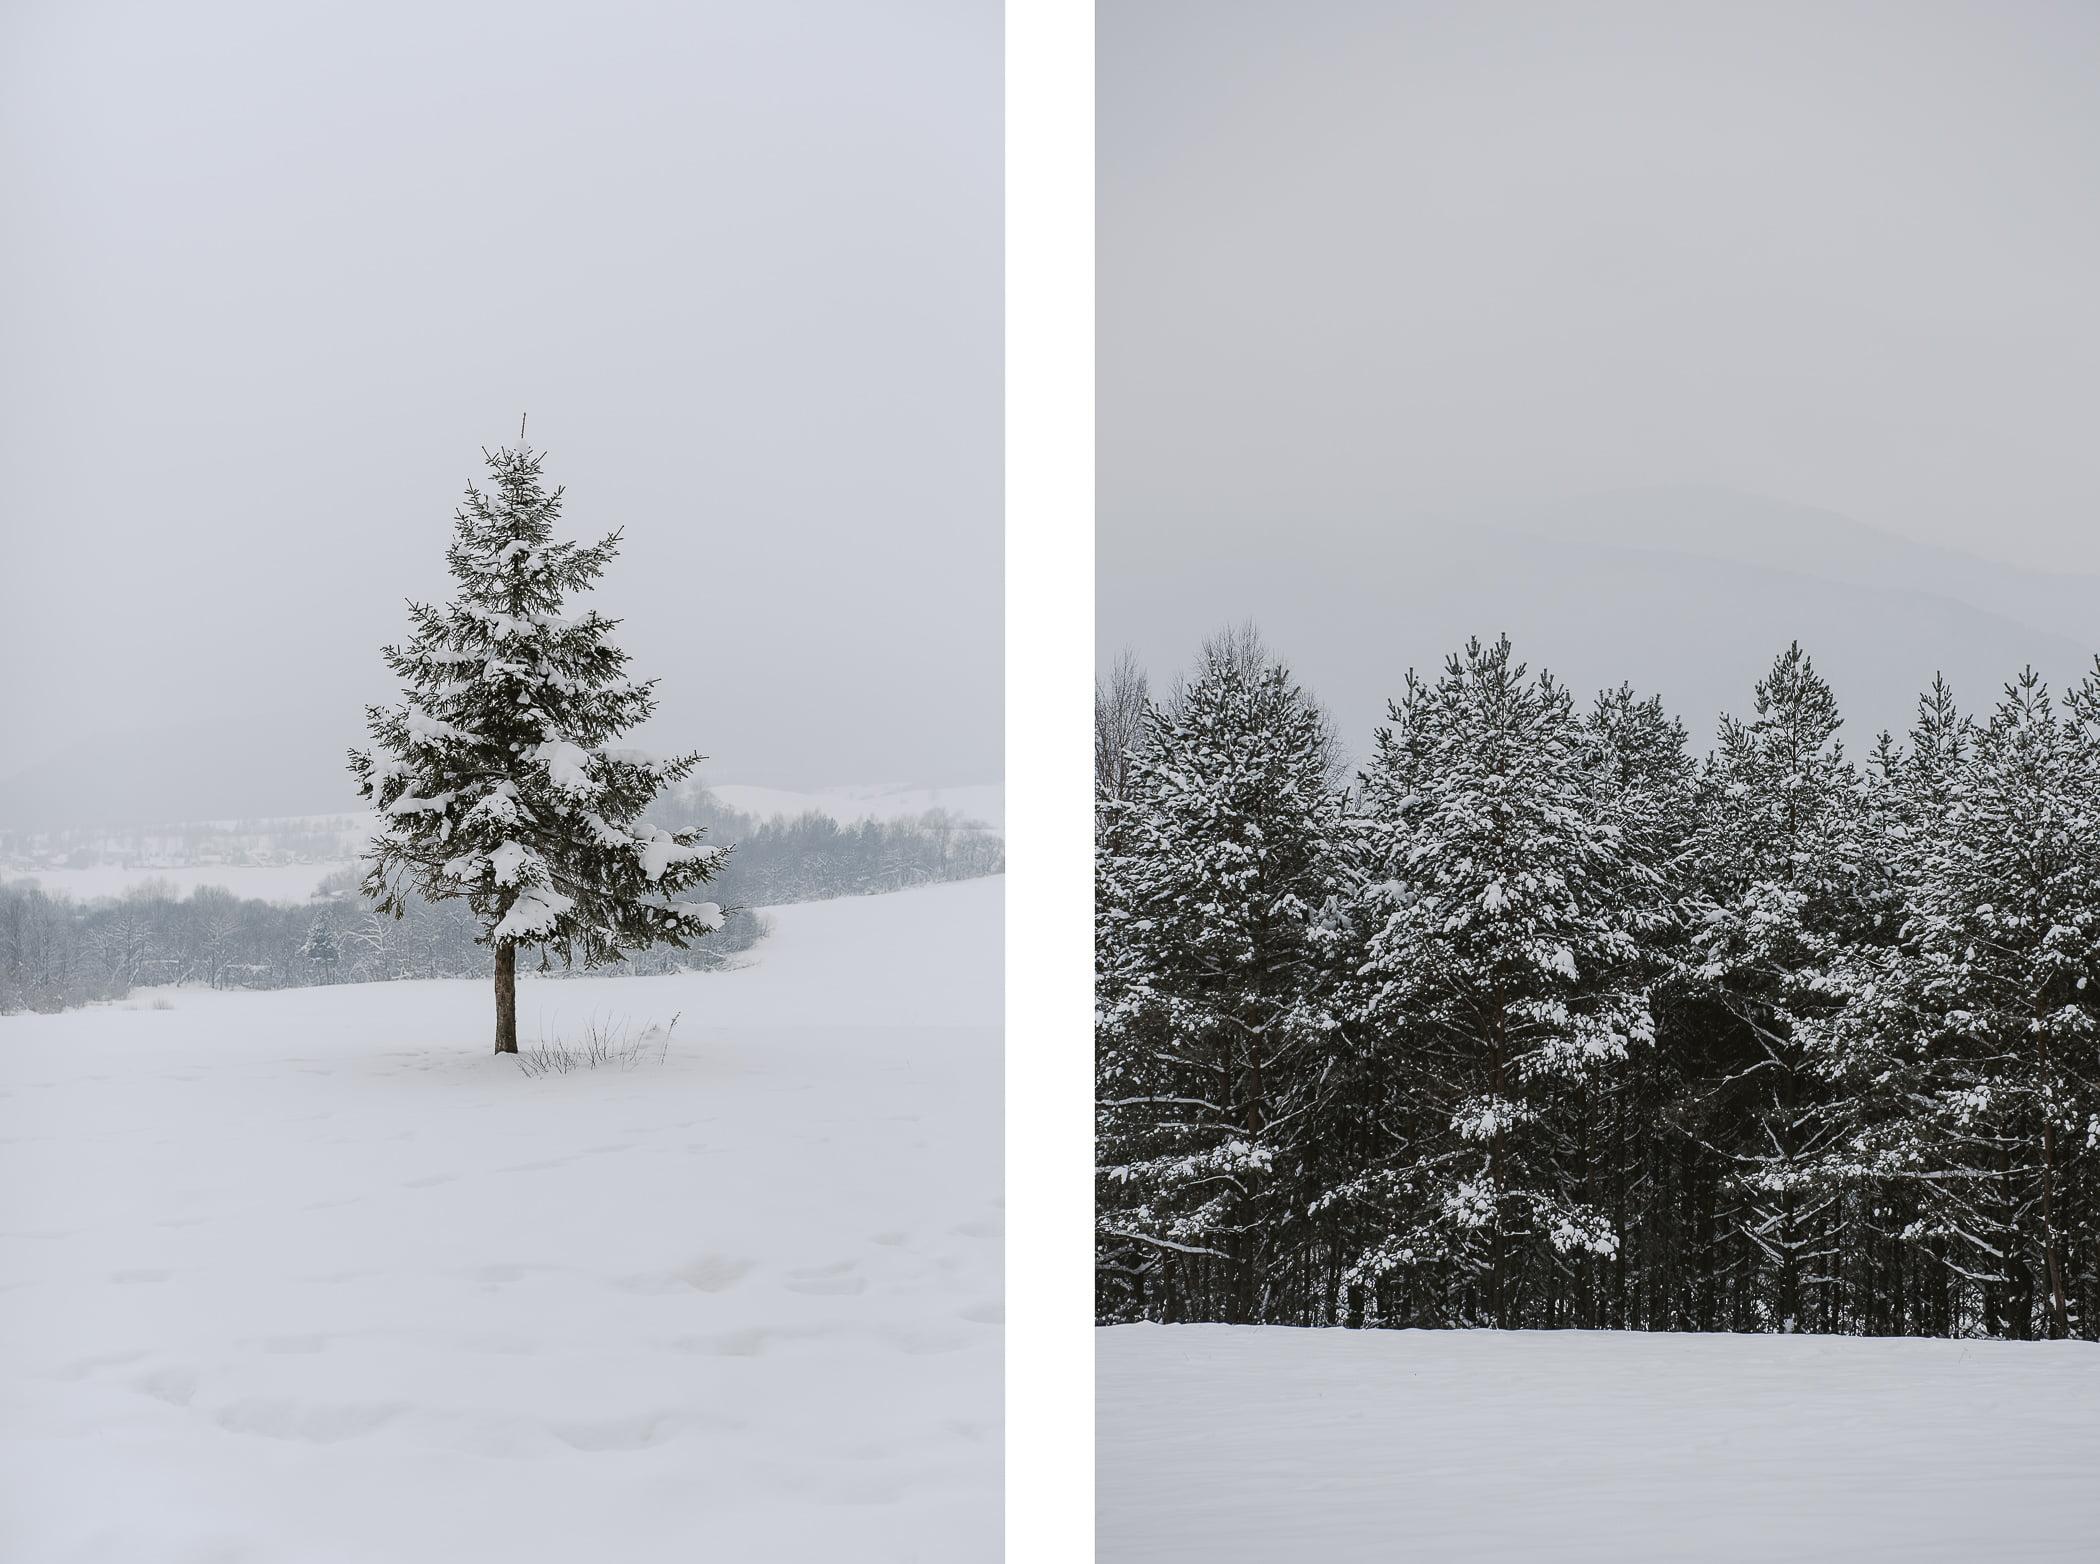 Beskid Niski zimą w3 dni